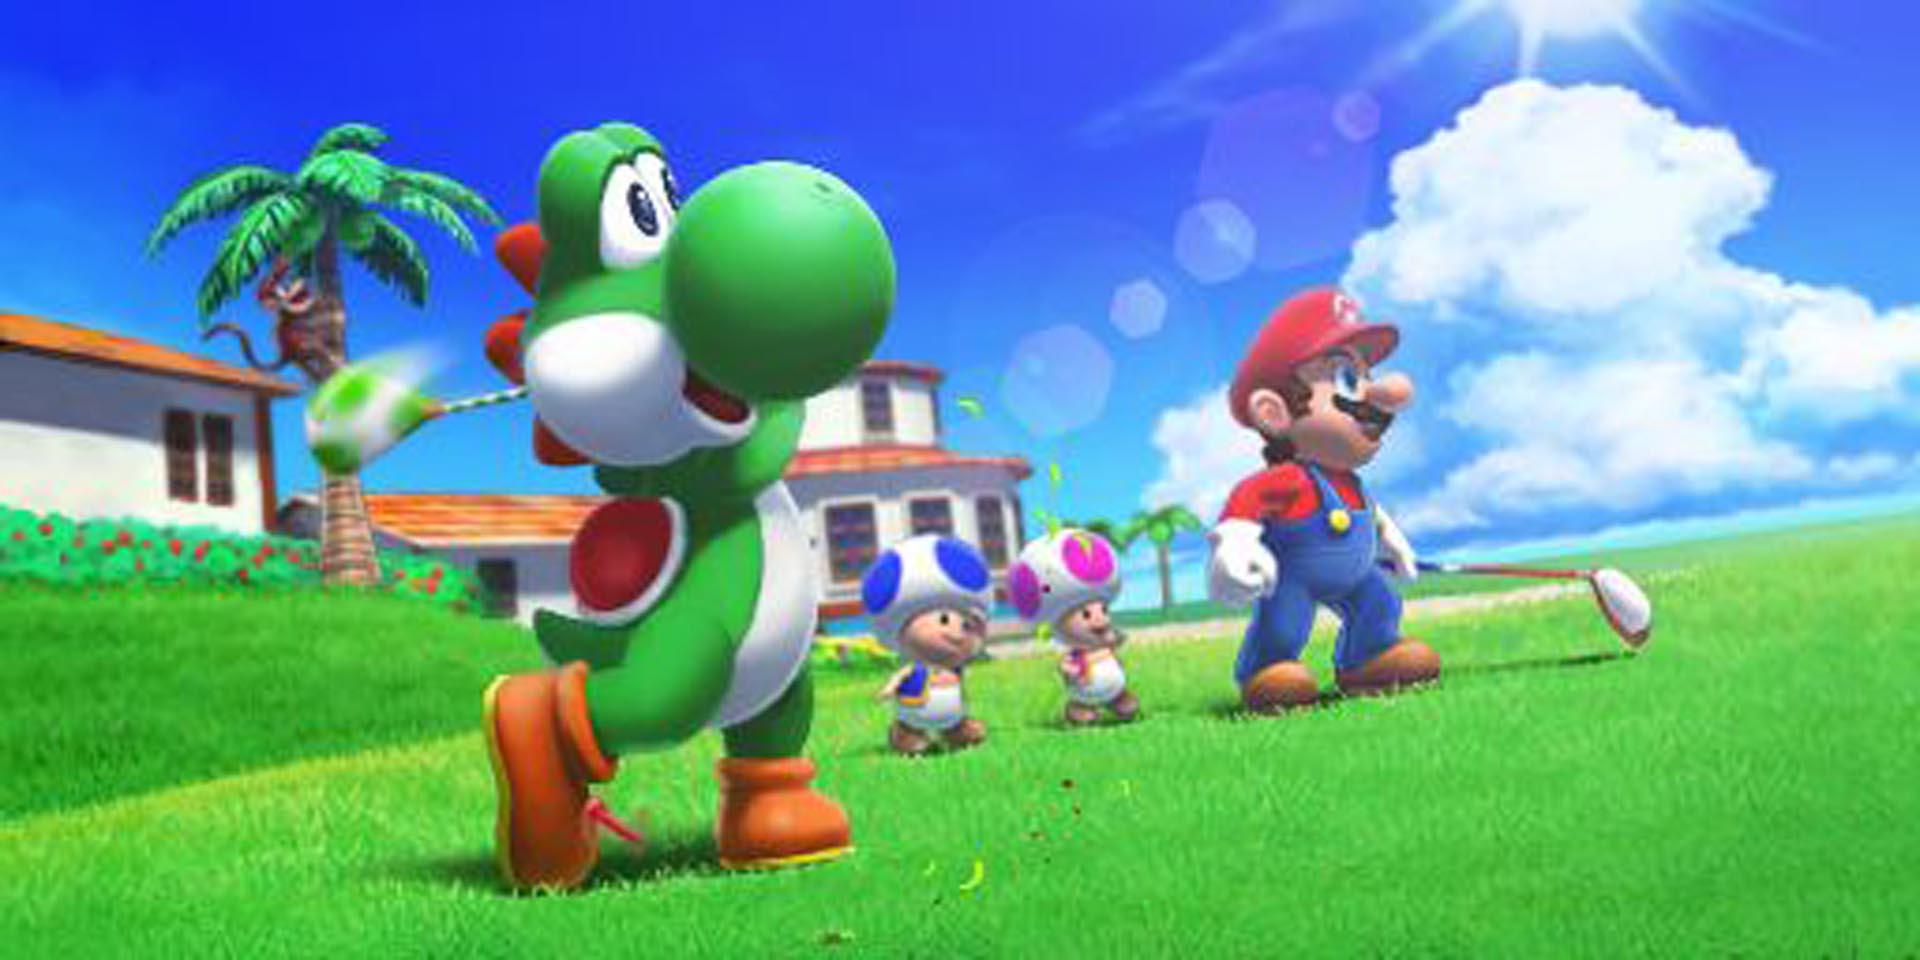 3_N3DS_MarioSportsSuperstars_Screenshot_CTRP_AUN_illu04_R_ad